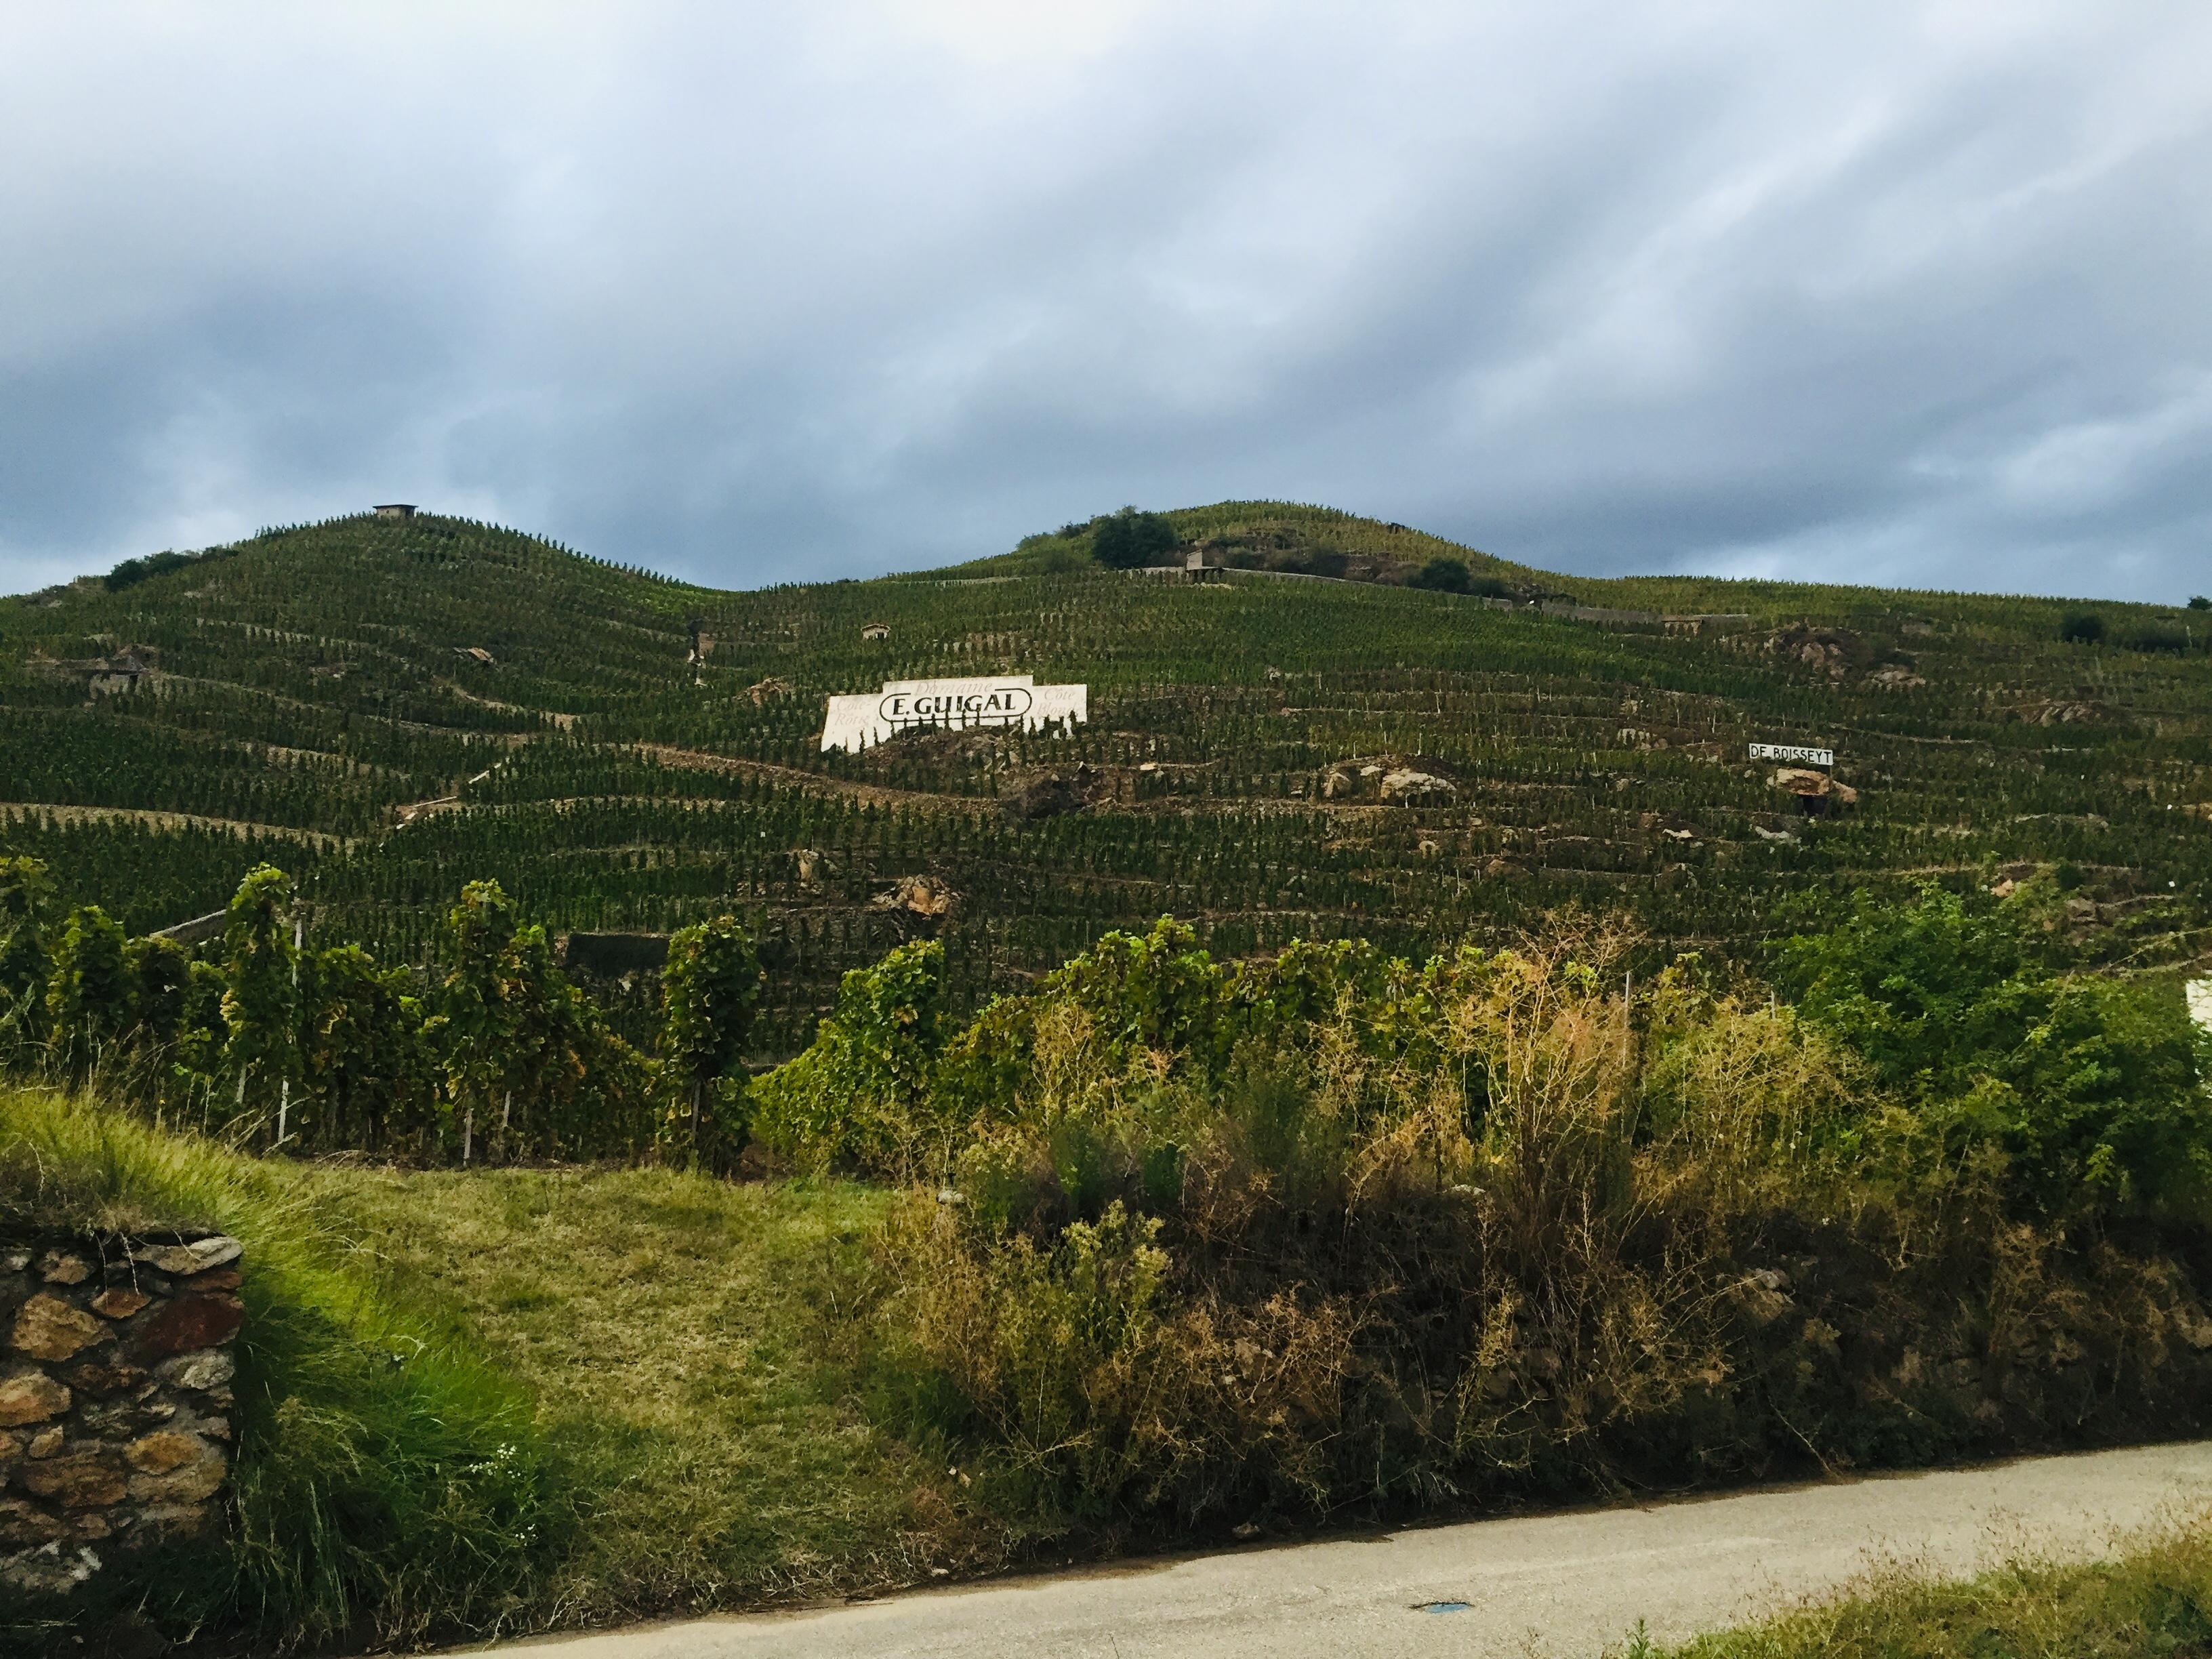 Guigal vineyards